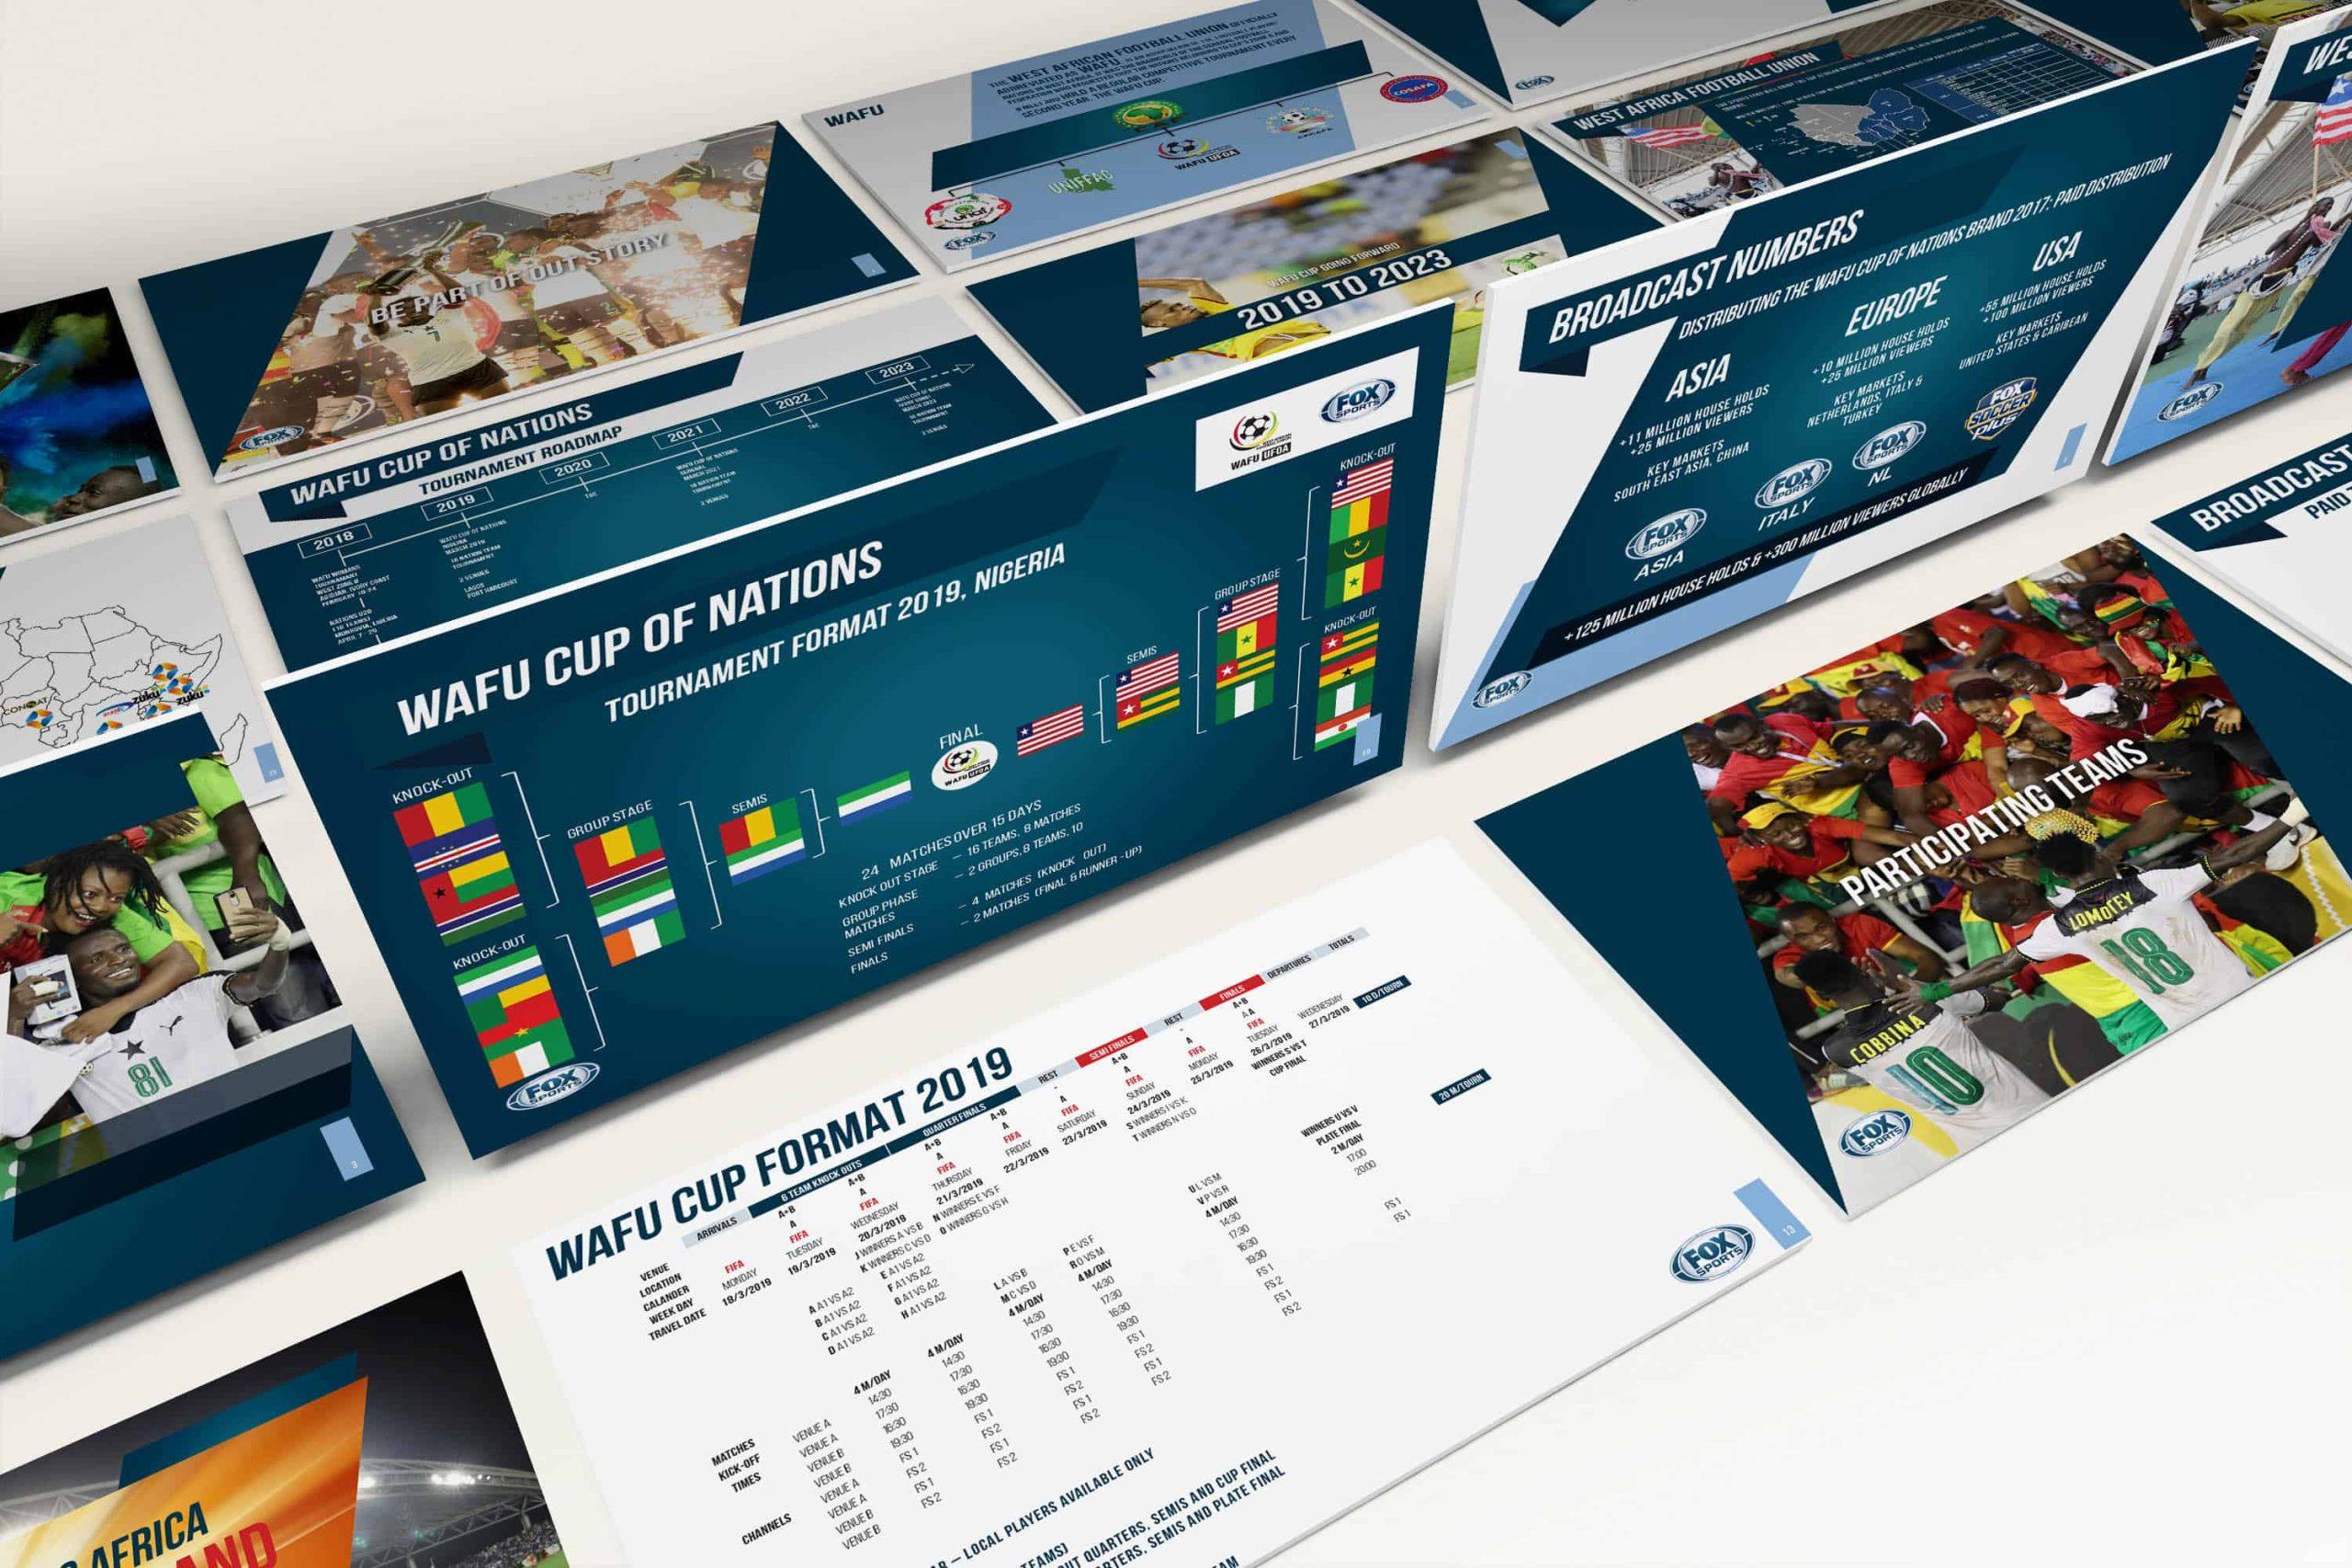 Proposal Presentation Design for Fox Sports WAFU Cup Sponsorship